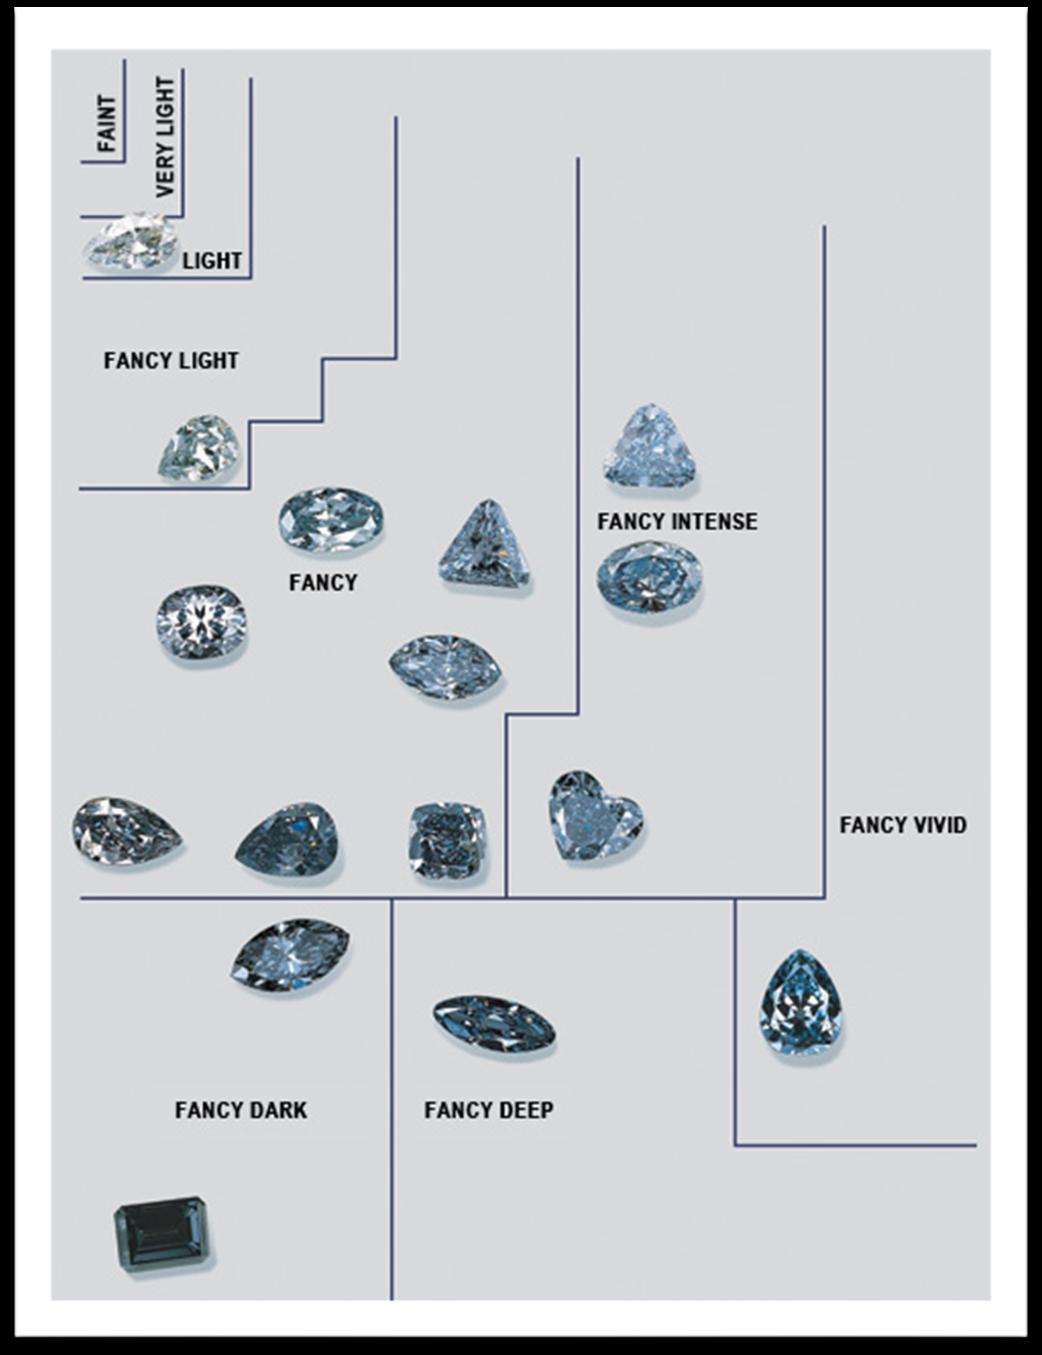 colour intensity for a blue diamond